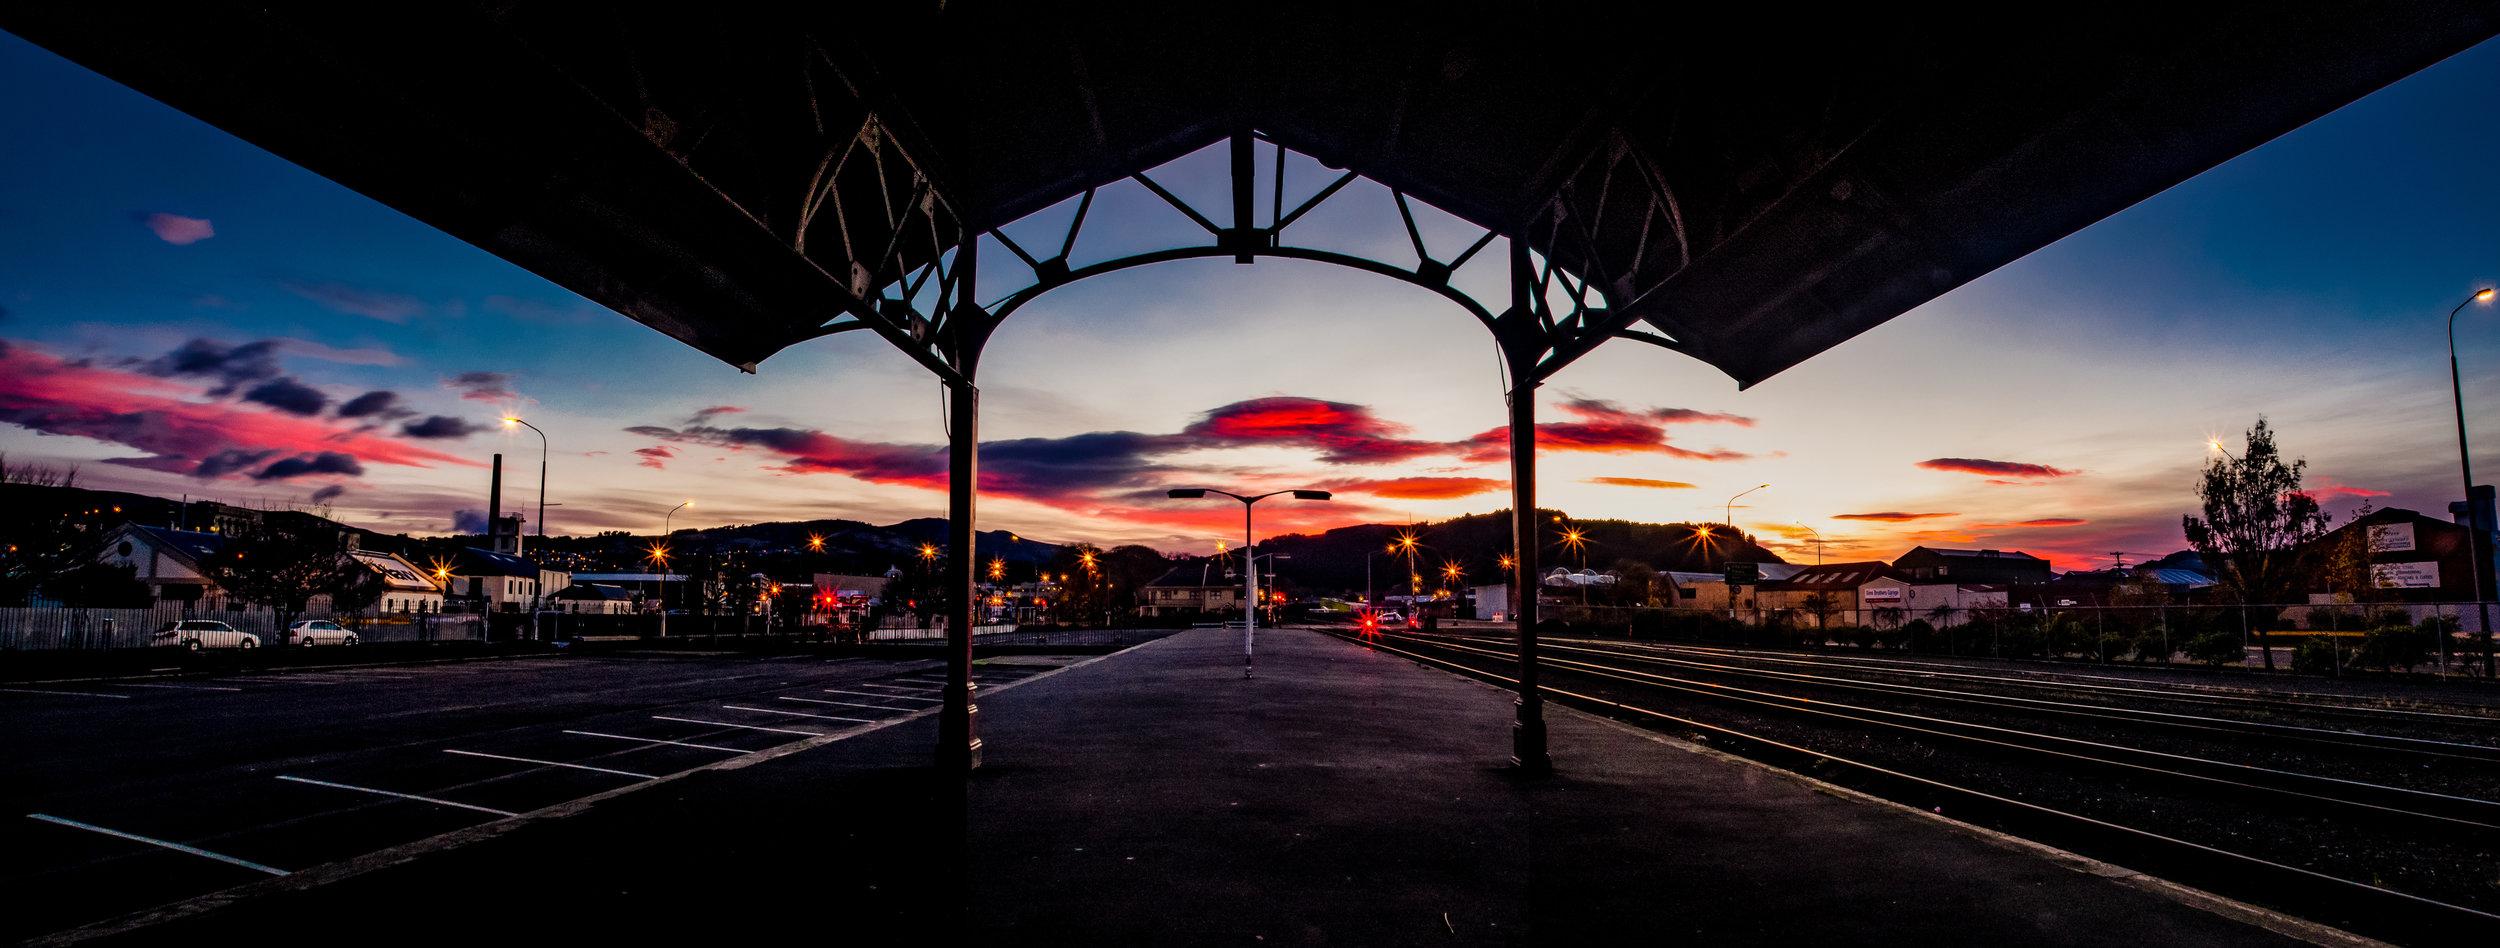 Train Station Pano.jpg